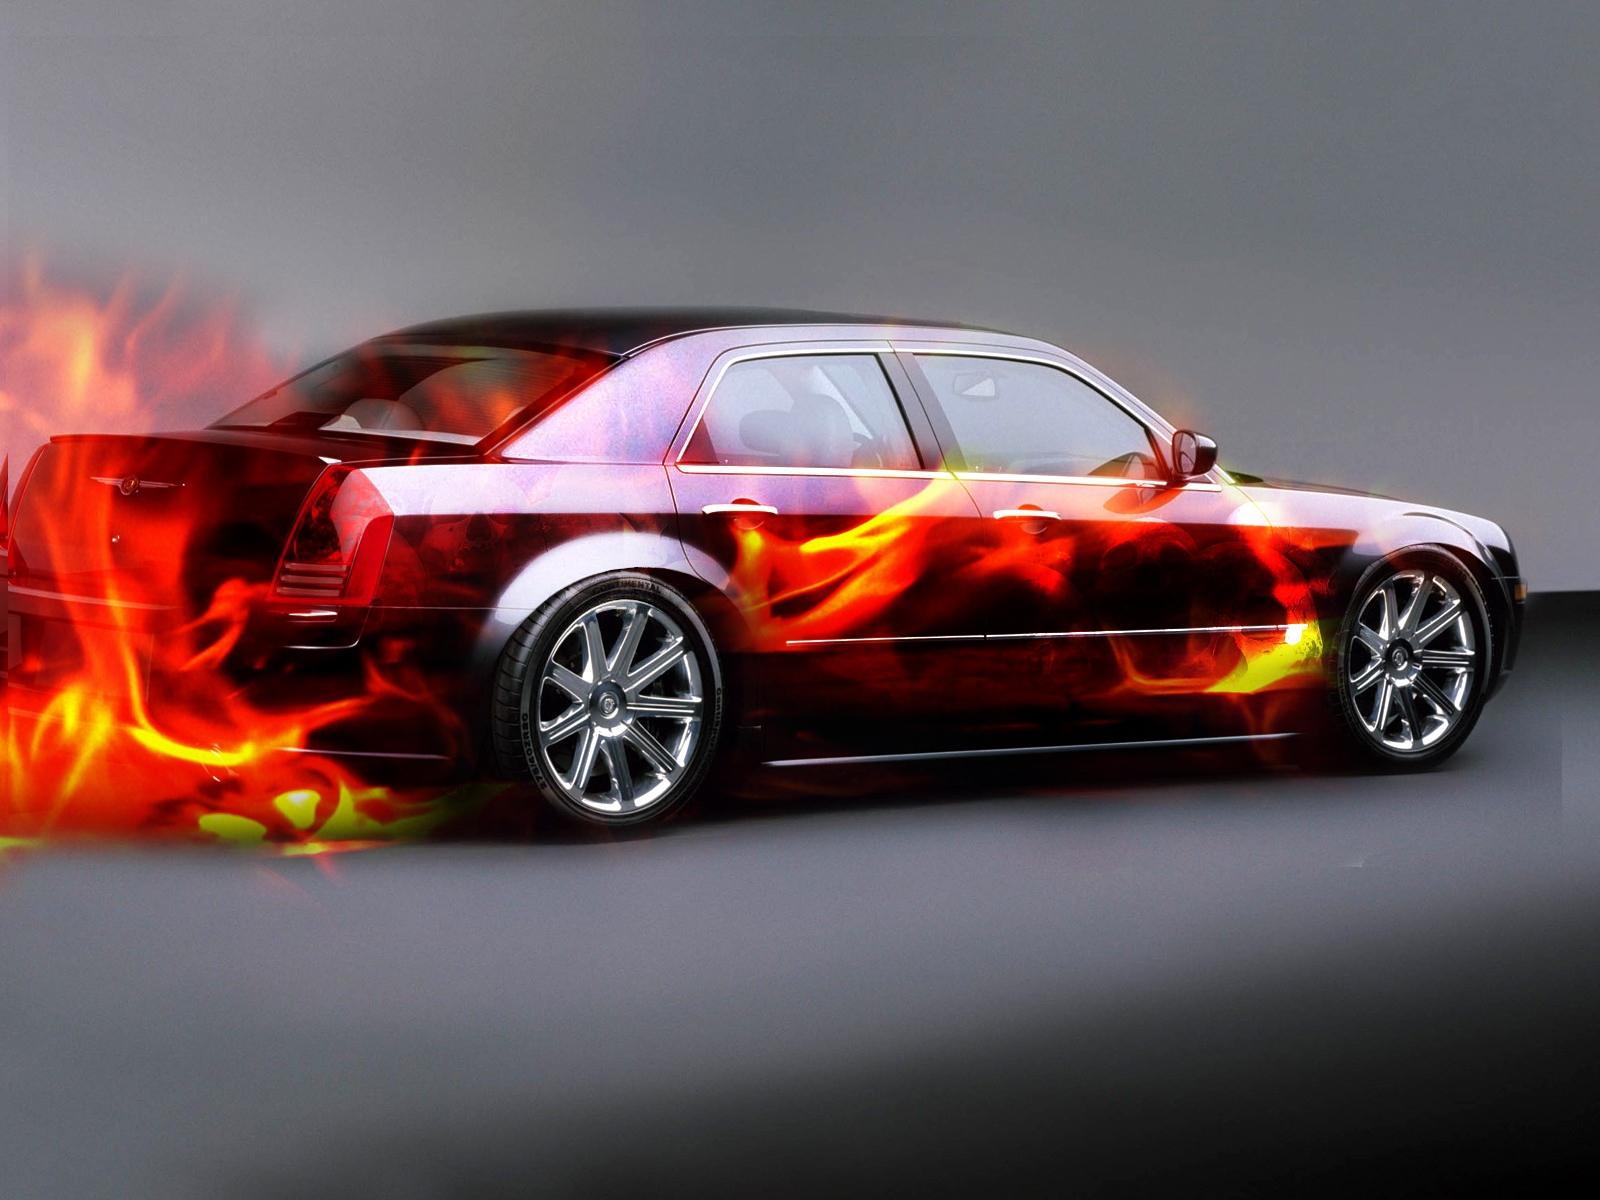 http://4.bp.blogspot.com/-_wi-_85DdQs/T60AaOnIj6I/AAAAAAAACf0/a7DHW-FH21Y/s1600/super+car+pics-5.jpg